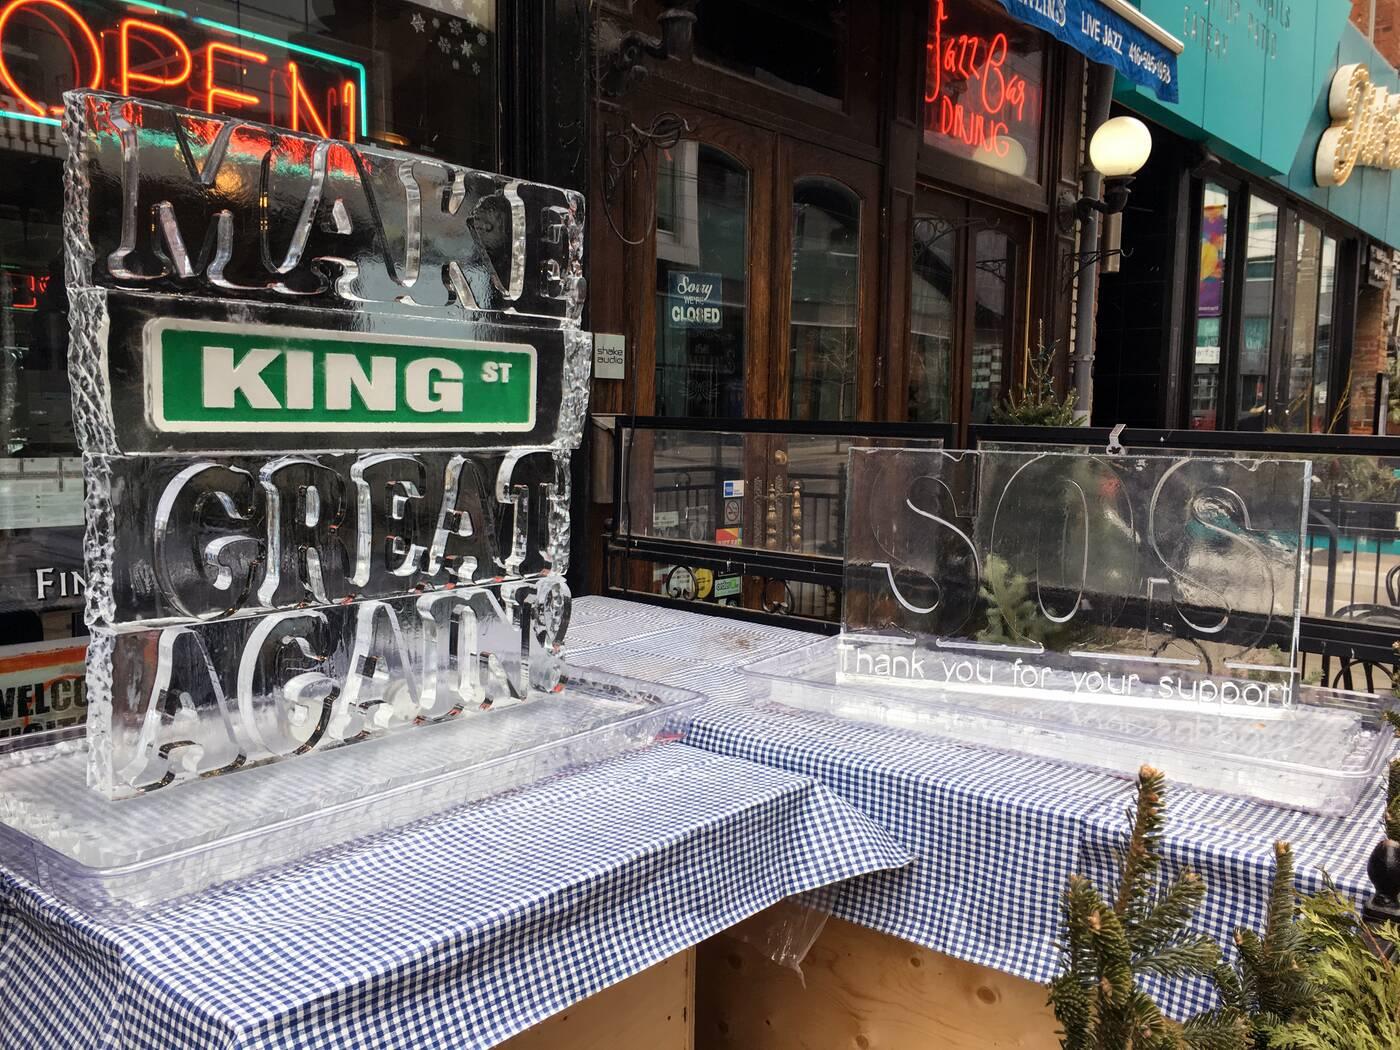 King Street ice